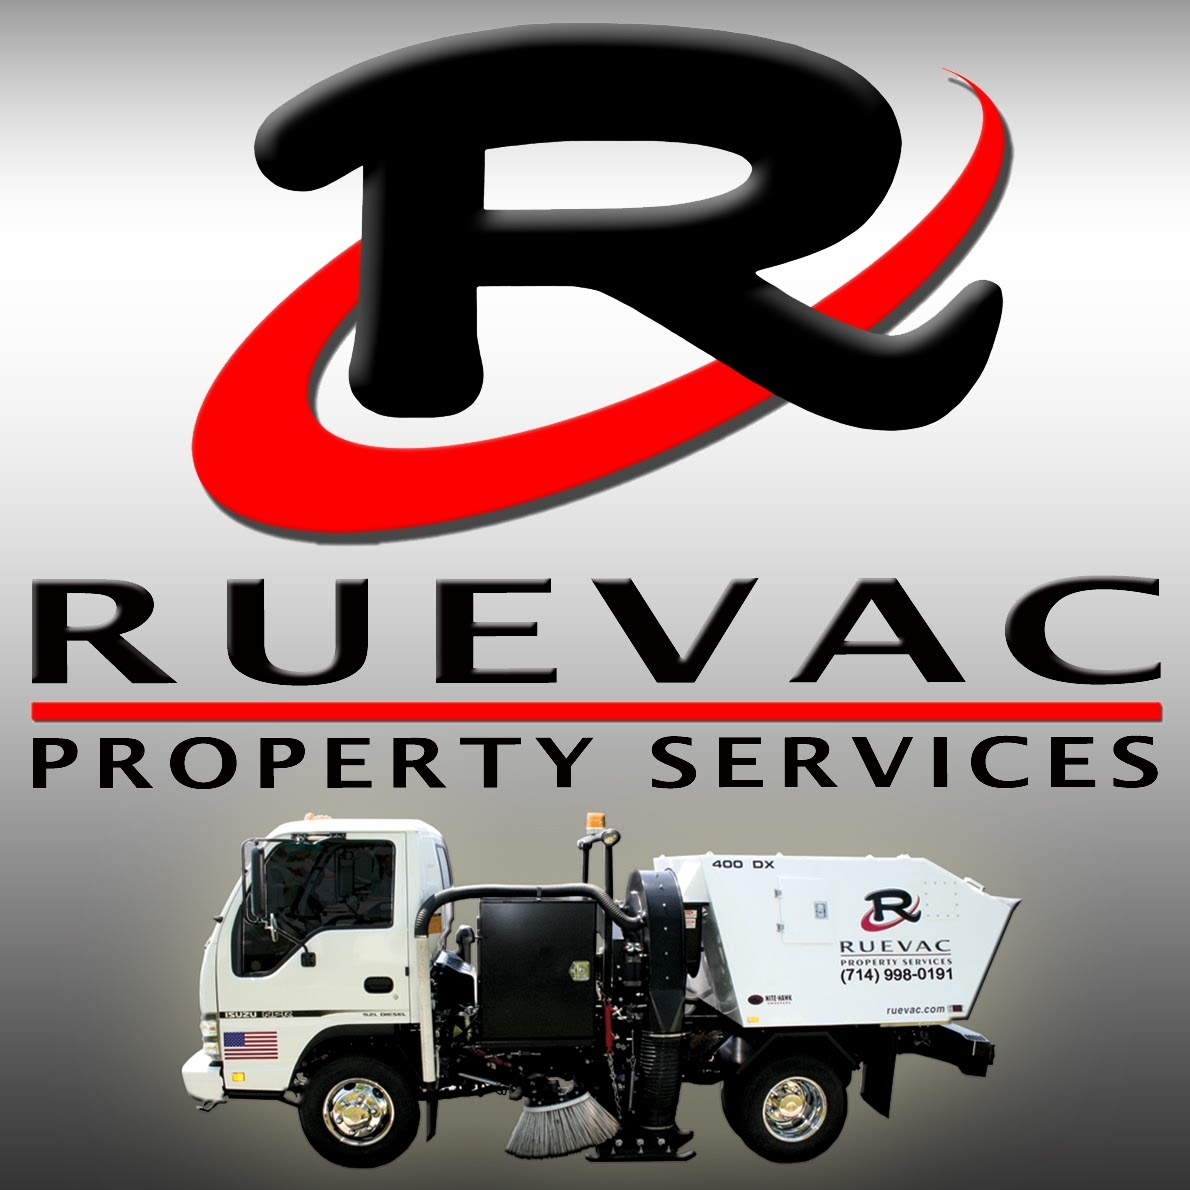 RueVac Property Services